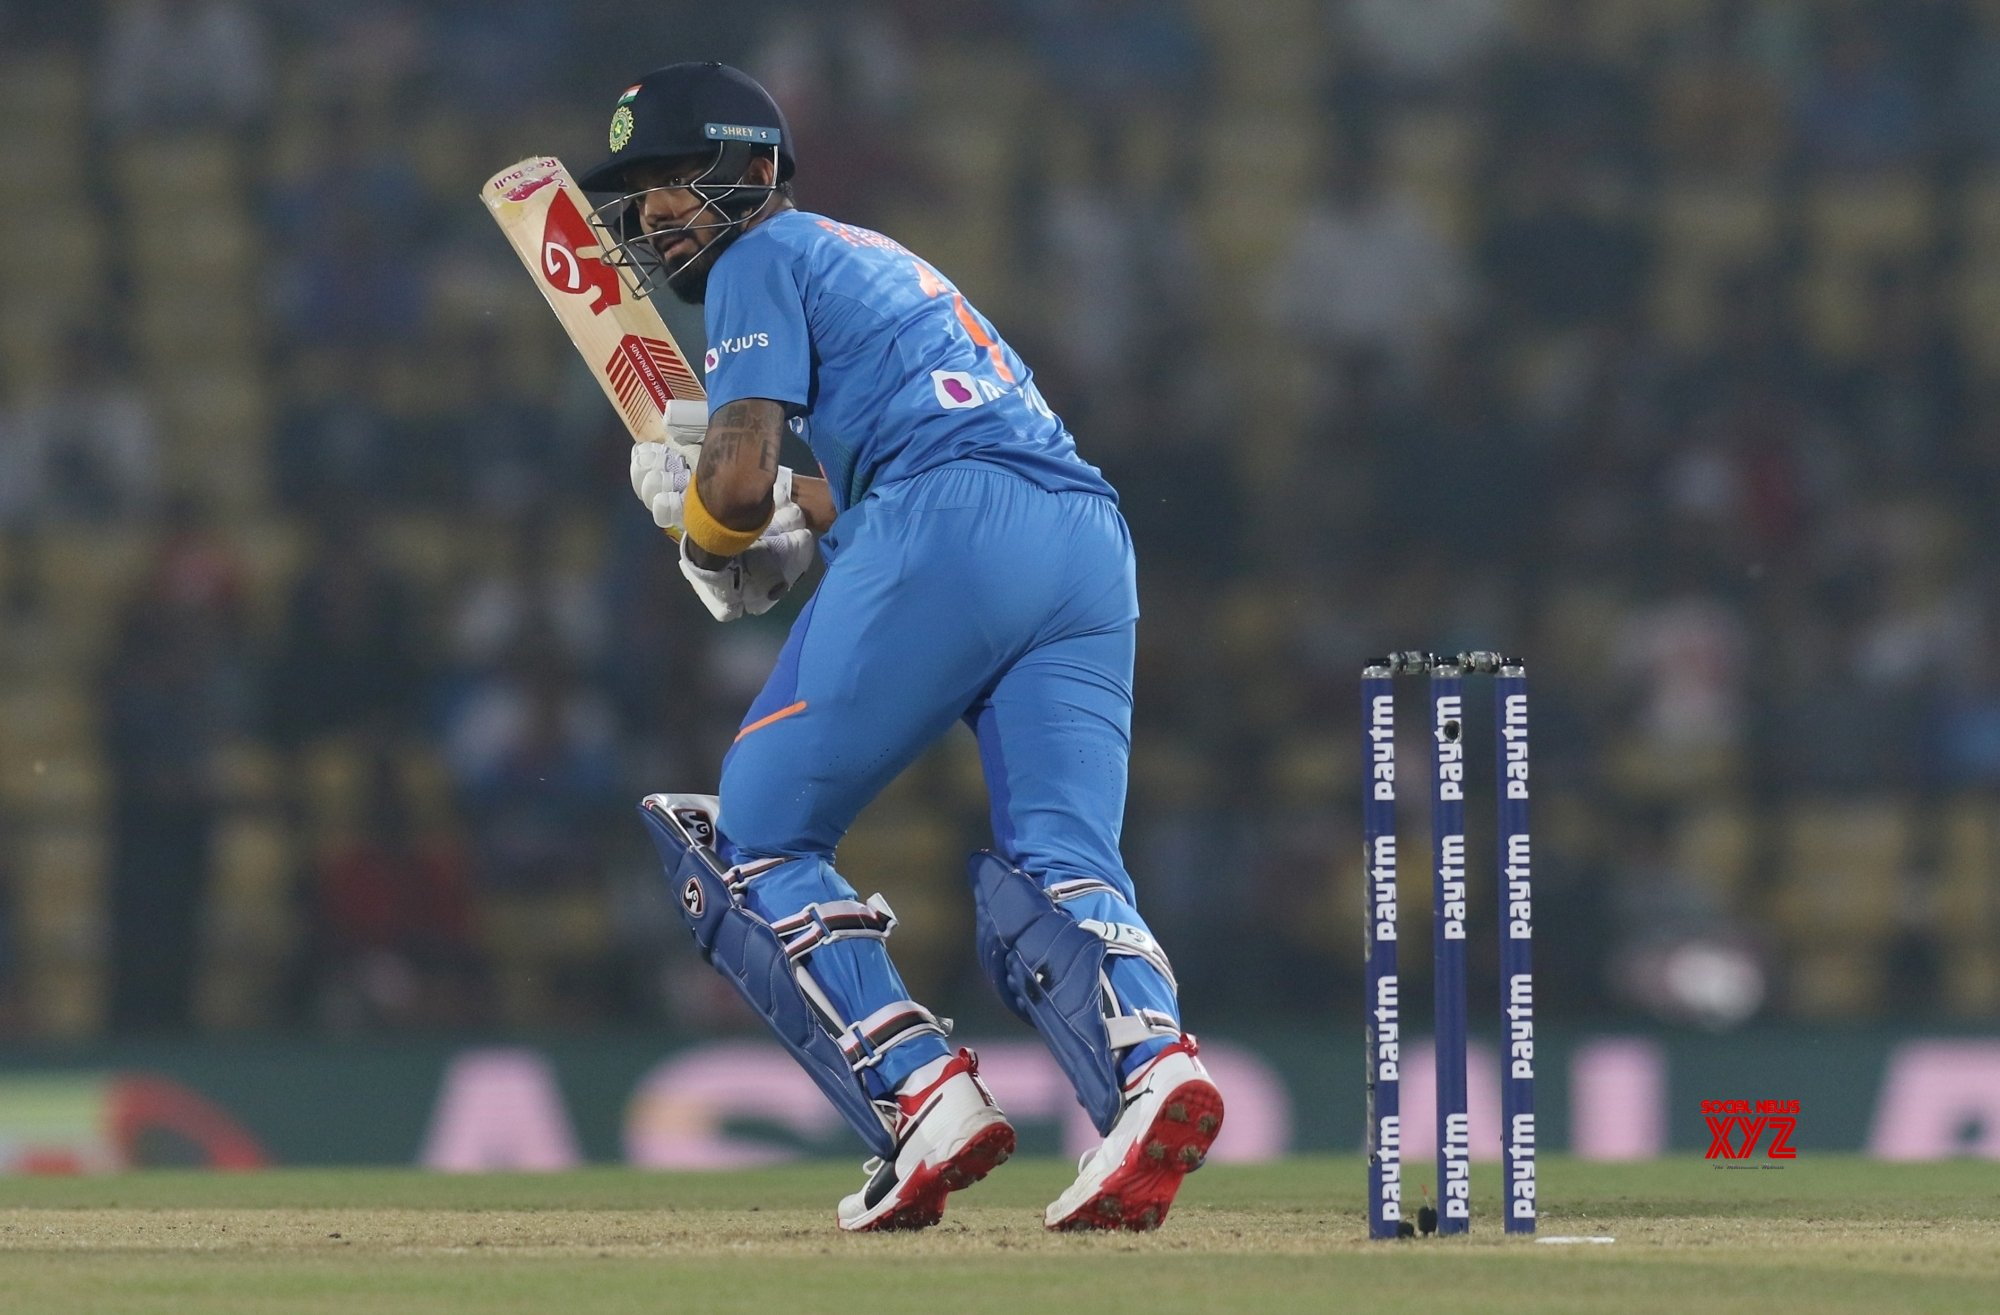 Nagpur: 3rd T20I - India Vs Bangladesh (Batch - 9) #Gallery